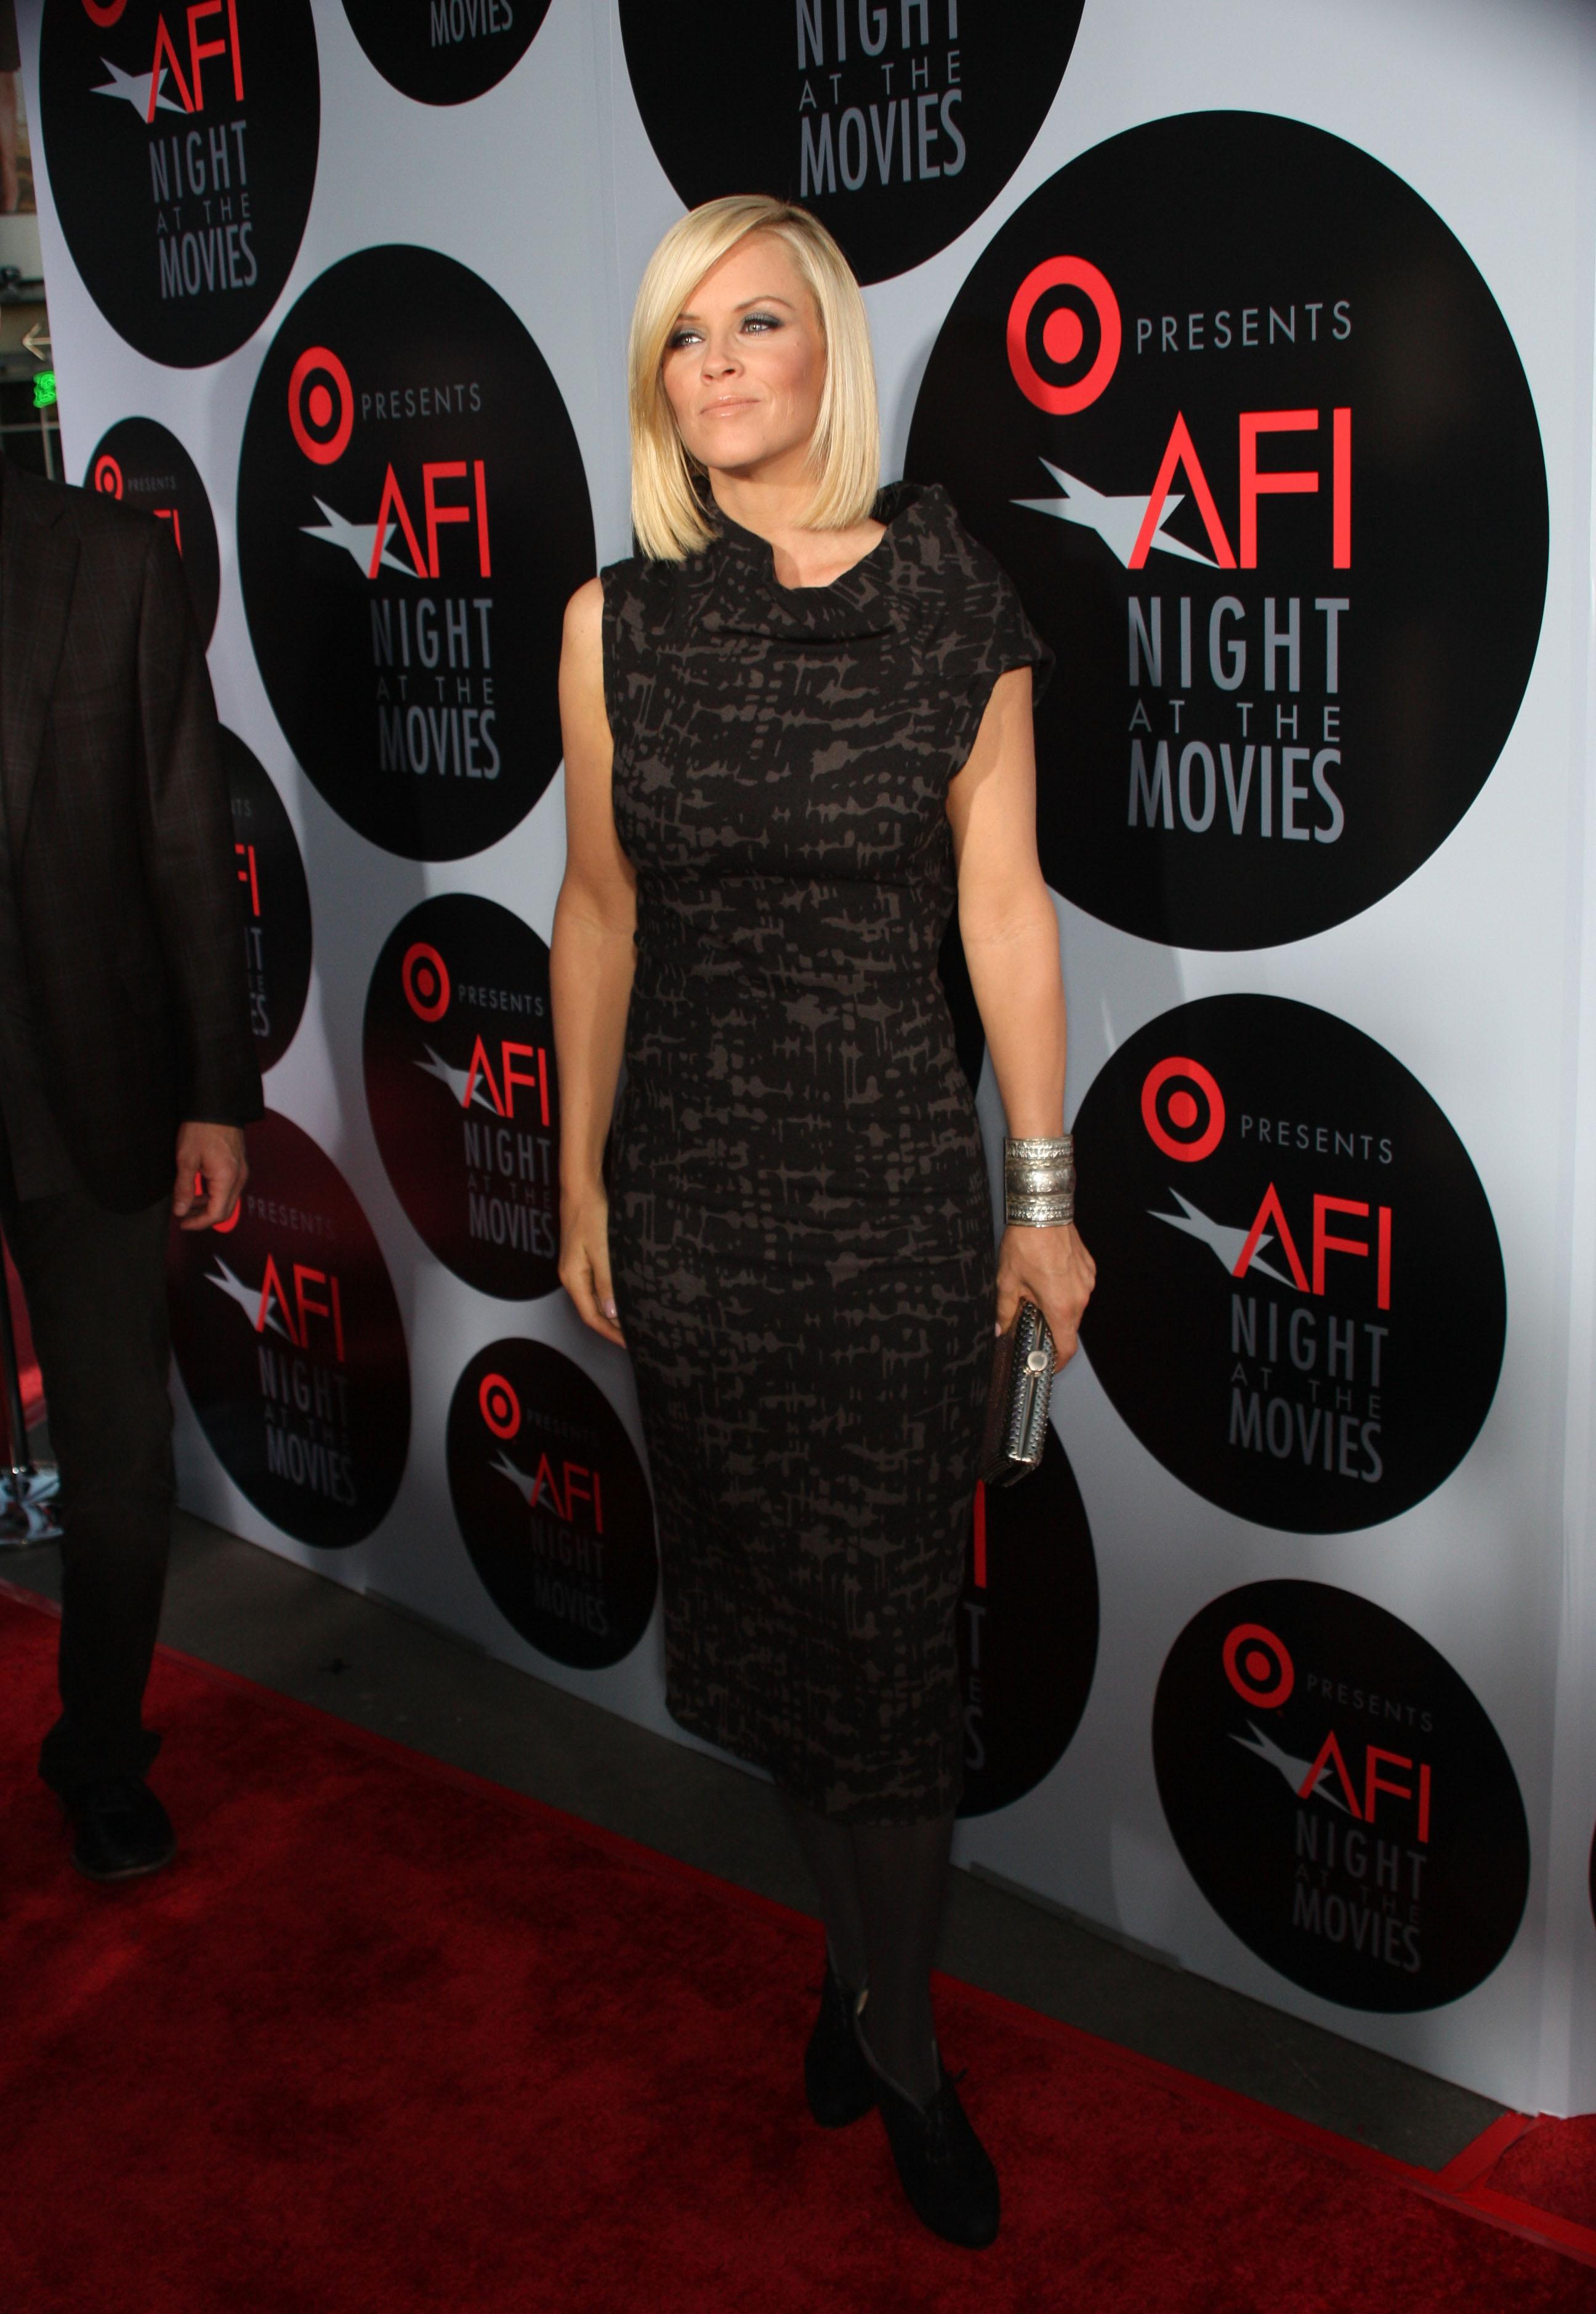 27138_Celebutopia-Jenny_McCarthy-AFI01s_Night_At_The_Movies-05_122_198lo.jpg